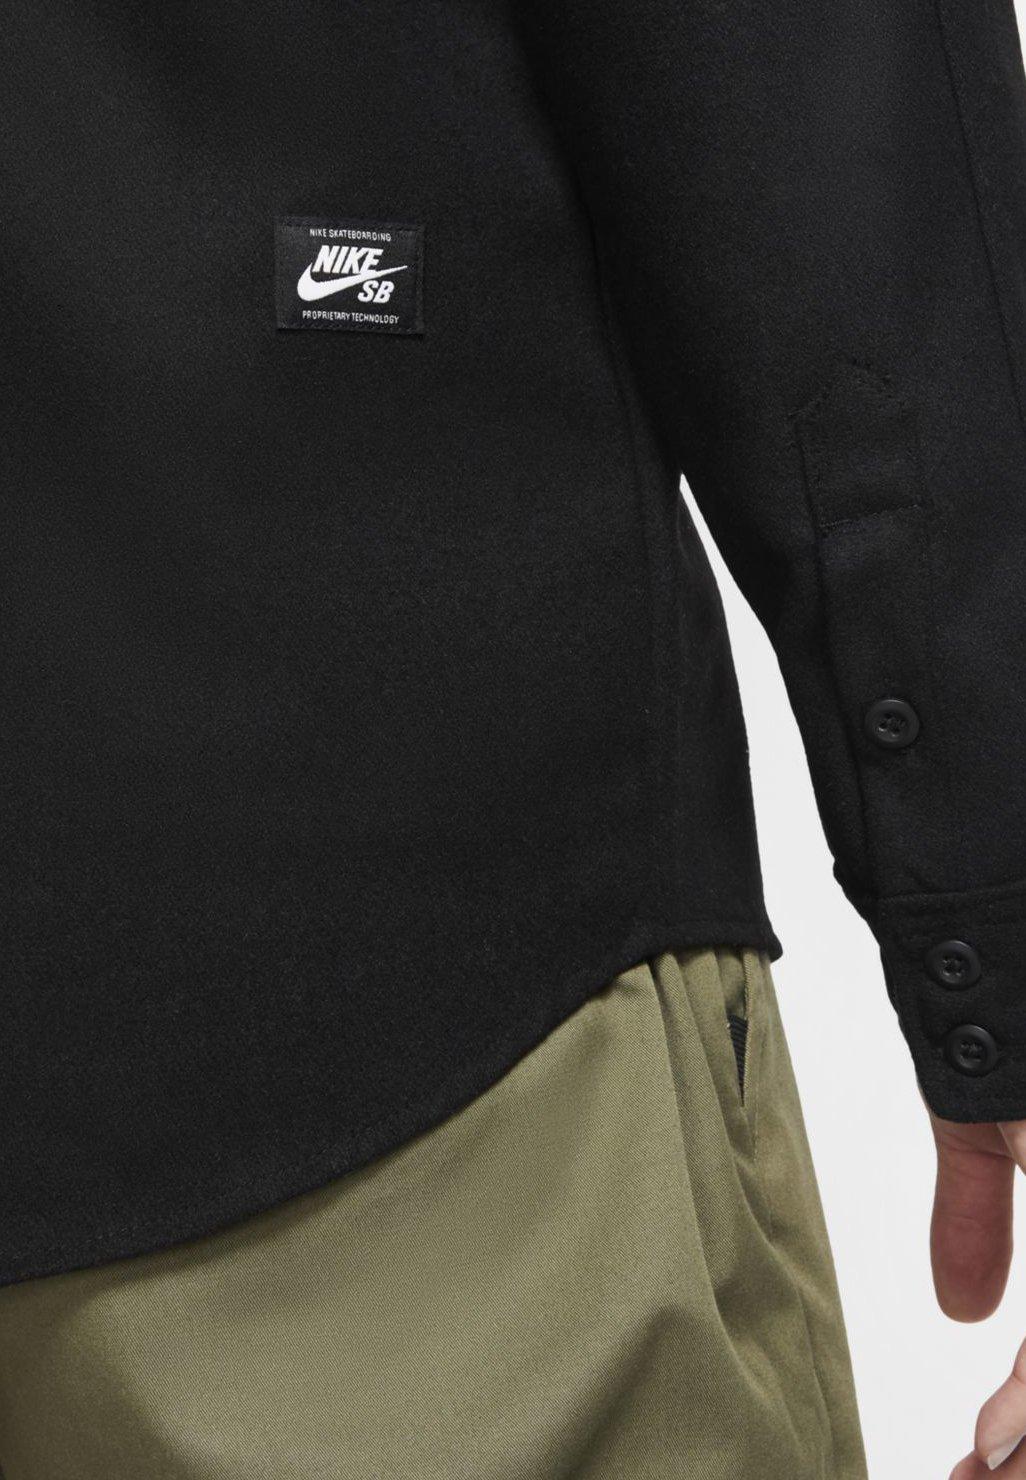 Nike SB Chemise - black/noir - ZALANDO.FR